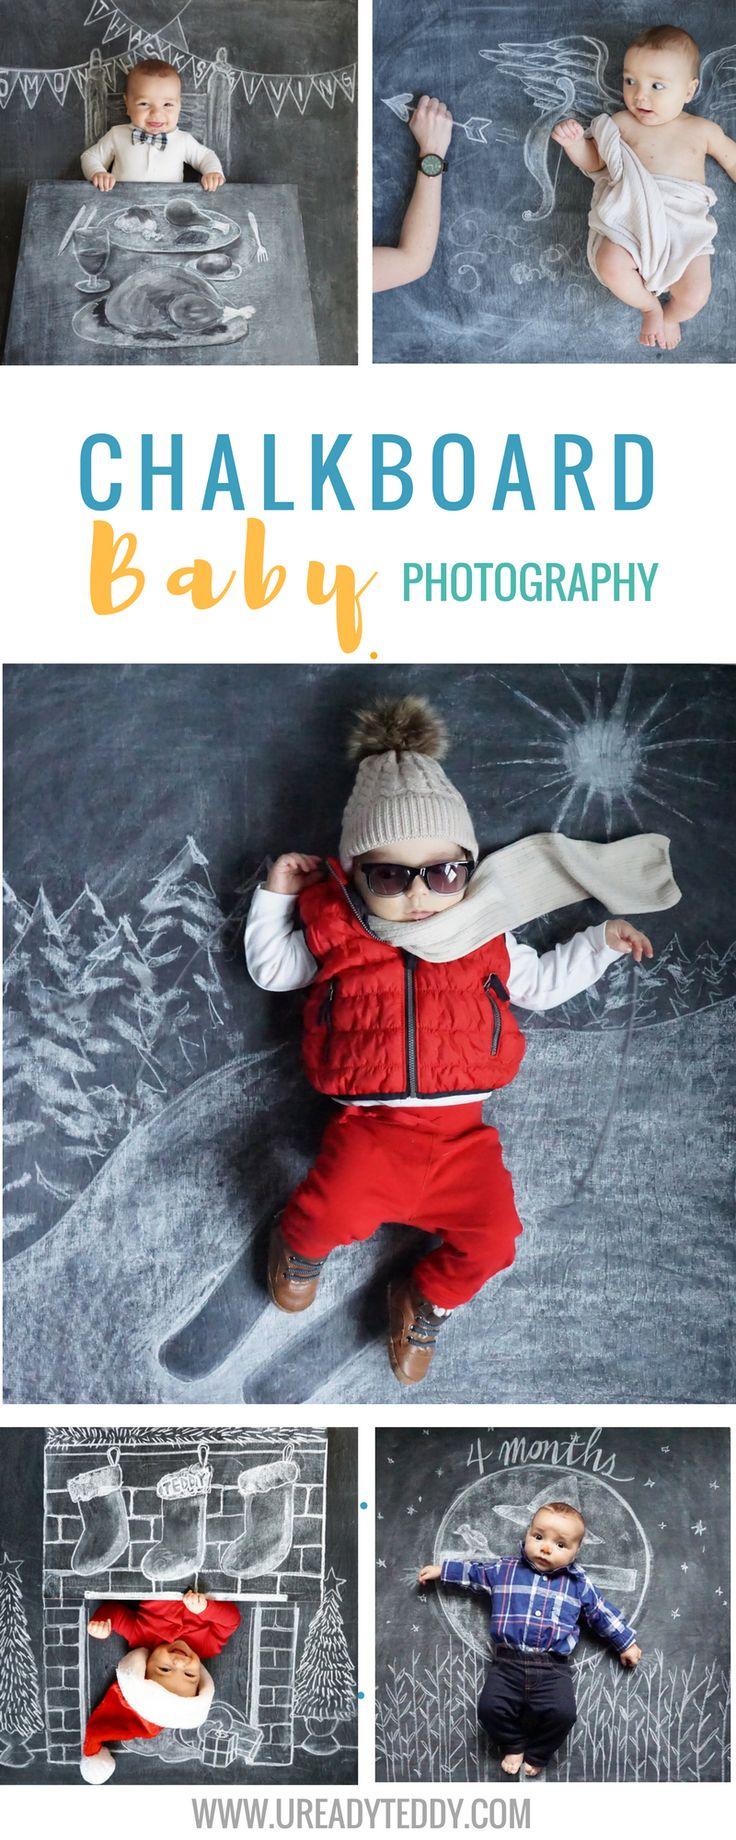 Creative chalkboards. Chalkboard Baby photography art. Newborn Photography. Chalk Art. Baby Chalkboard. Monthly Baby Photos. Blackboard. Sidewalk chalk.